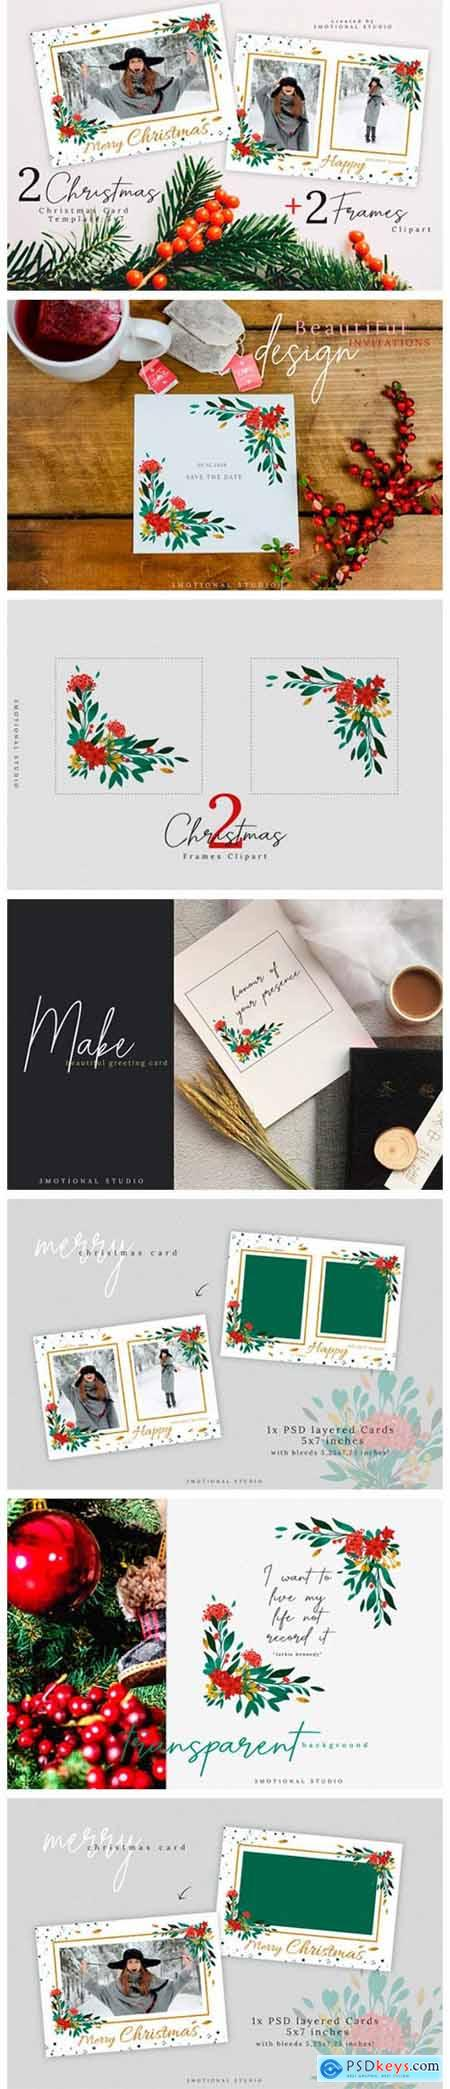 Merry Christmas Card Template 5x7 2363716